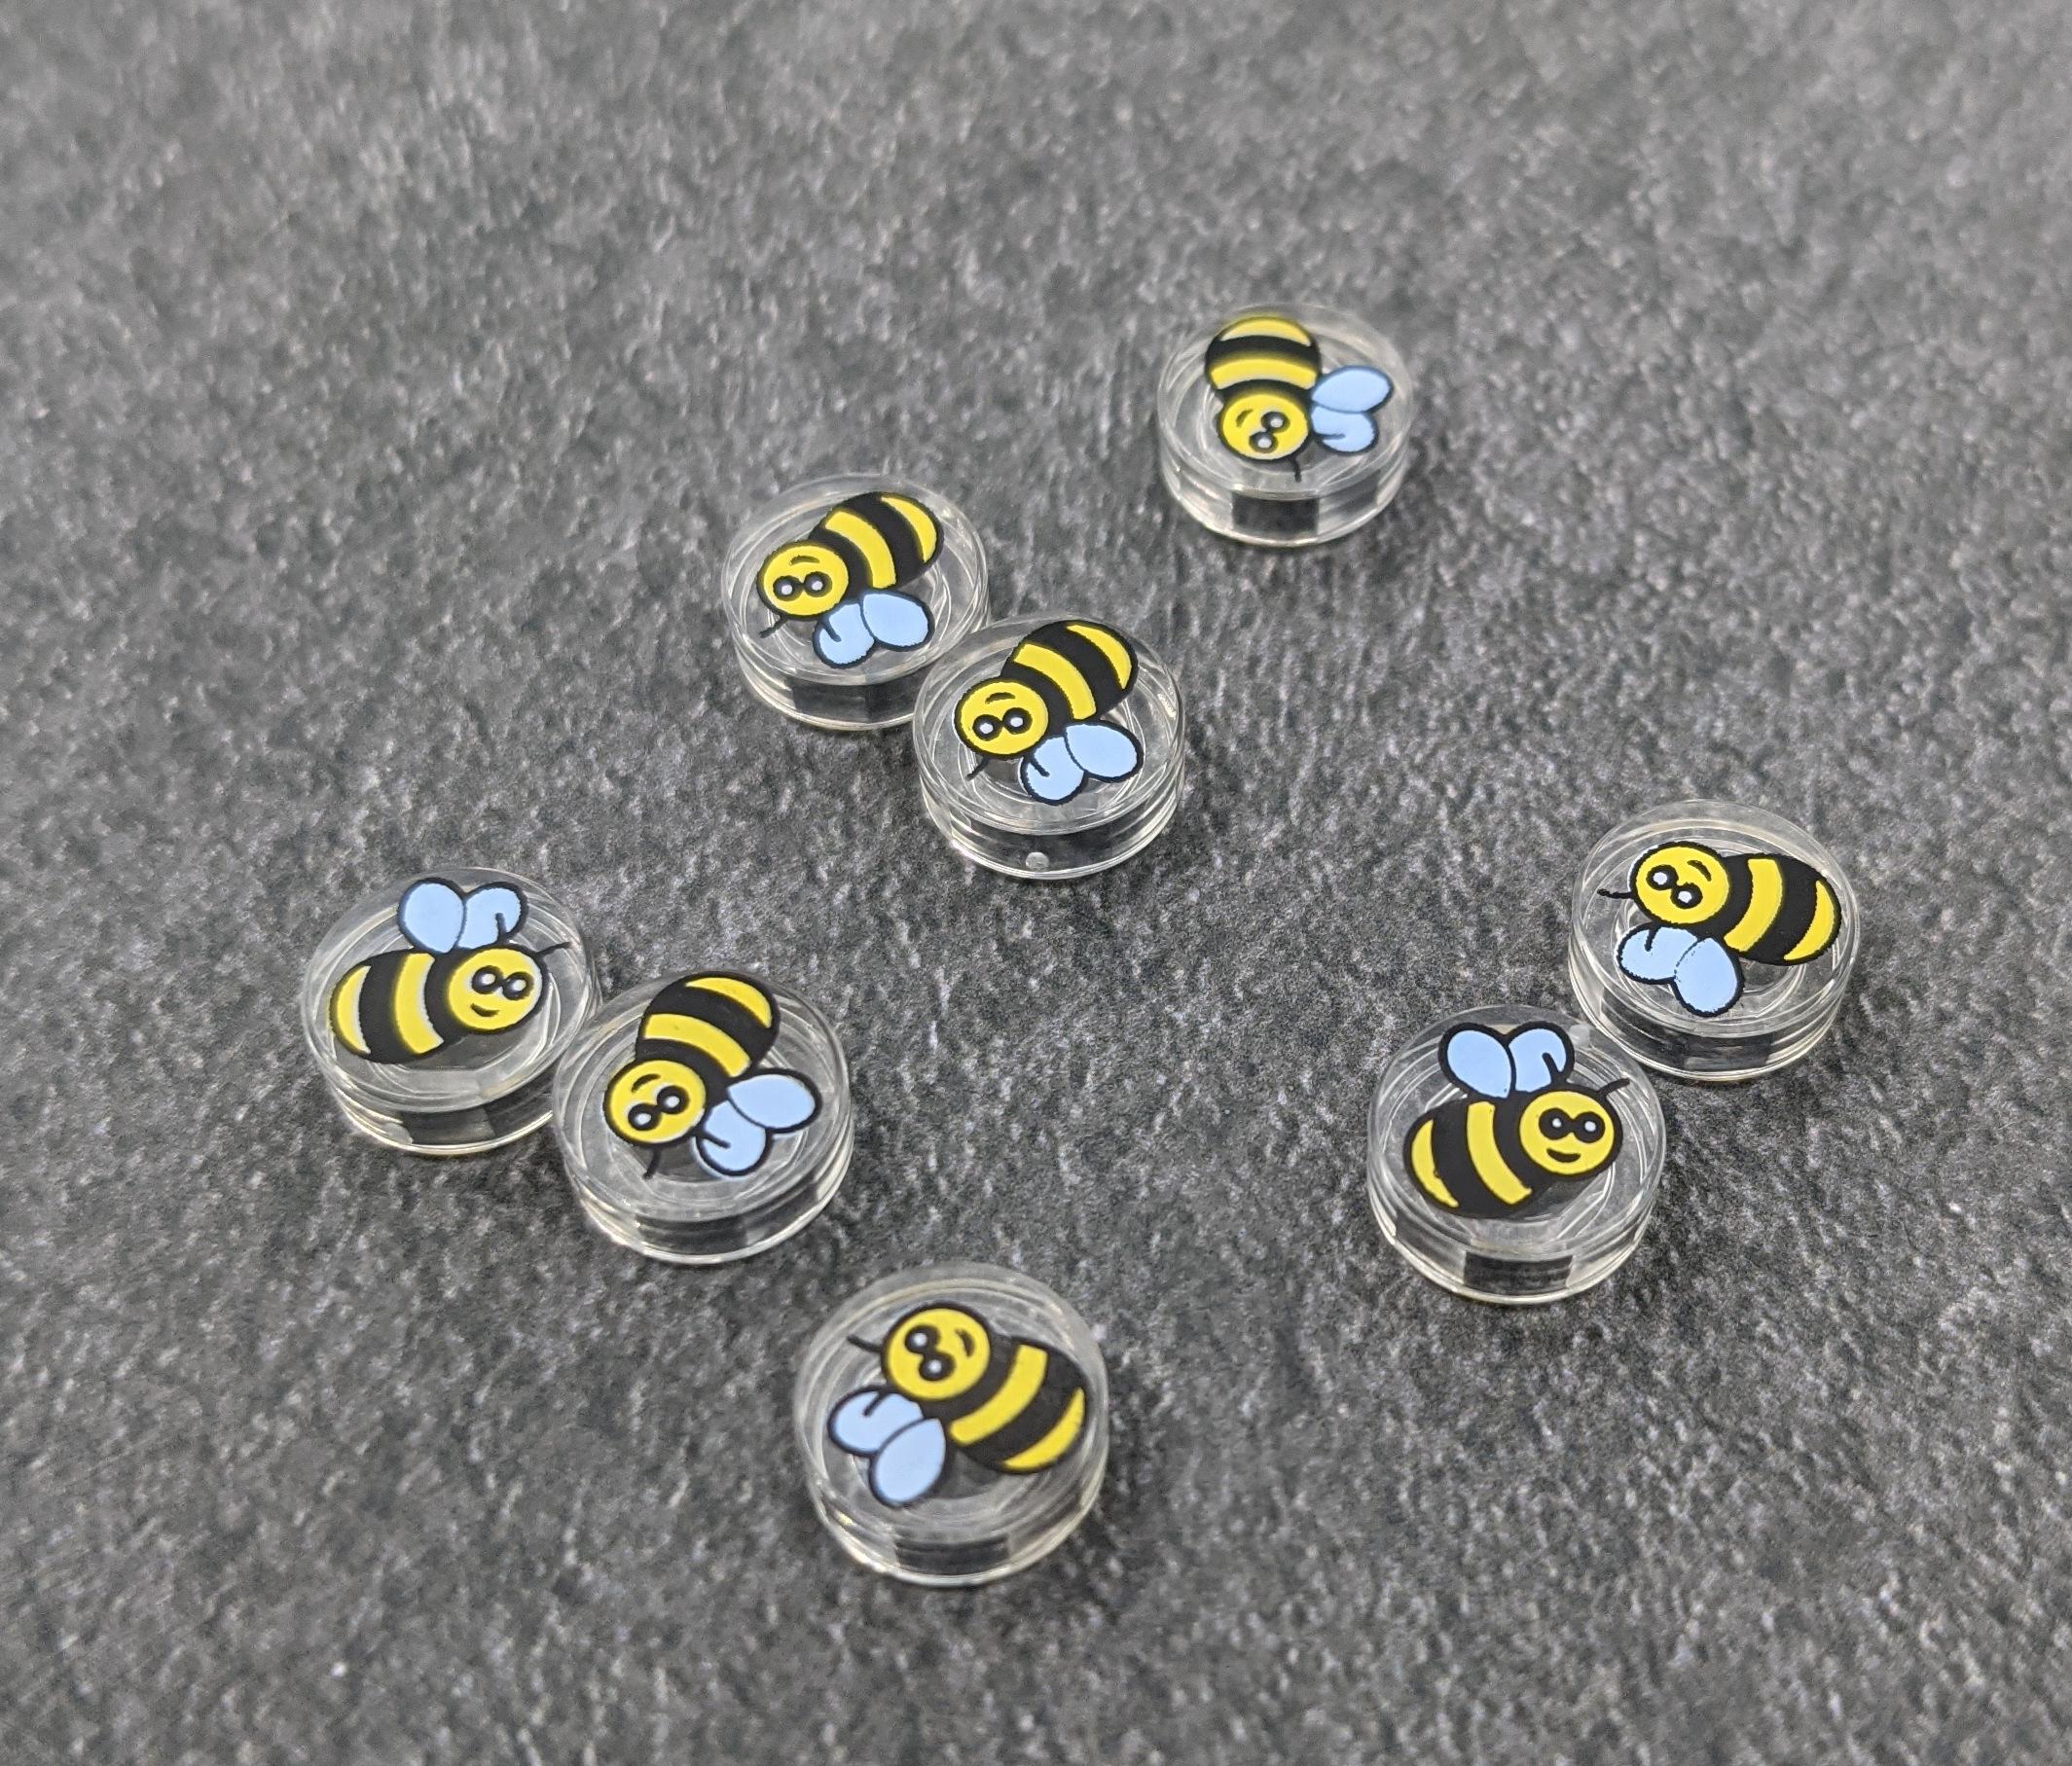 LEGO 21326 Winnie the Pooh Bee Tiles